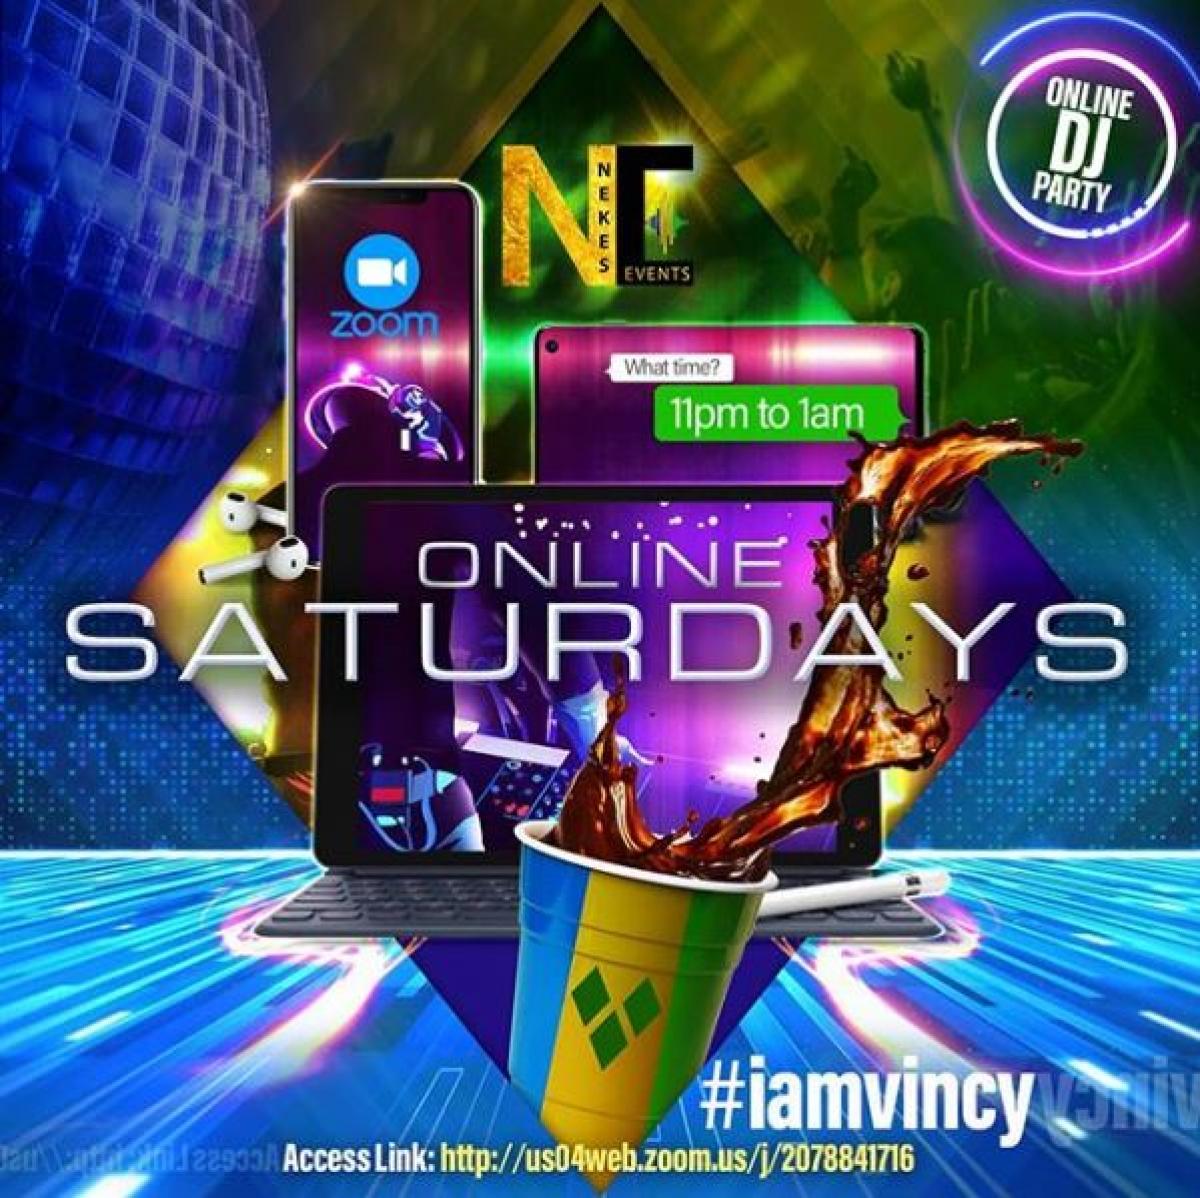 Online Saturdays flyer or graphic.